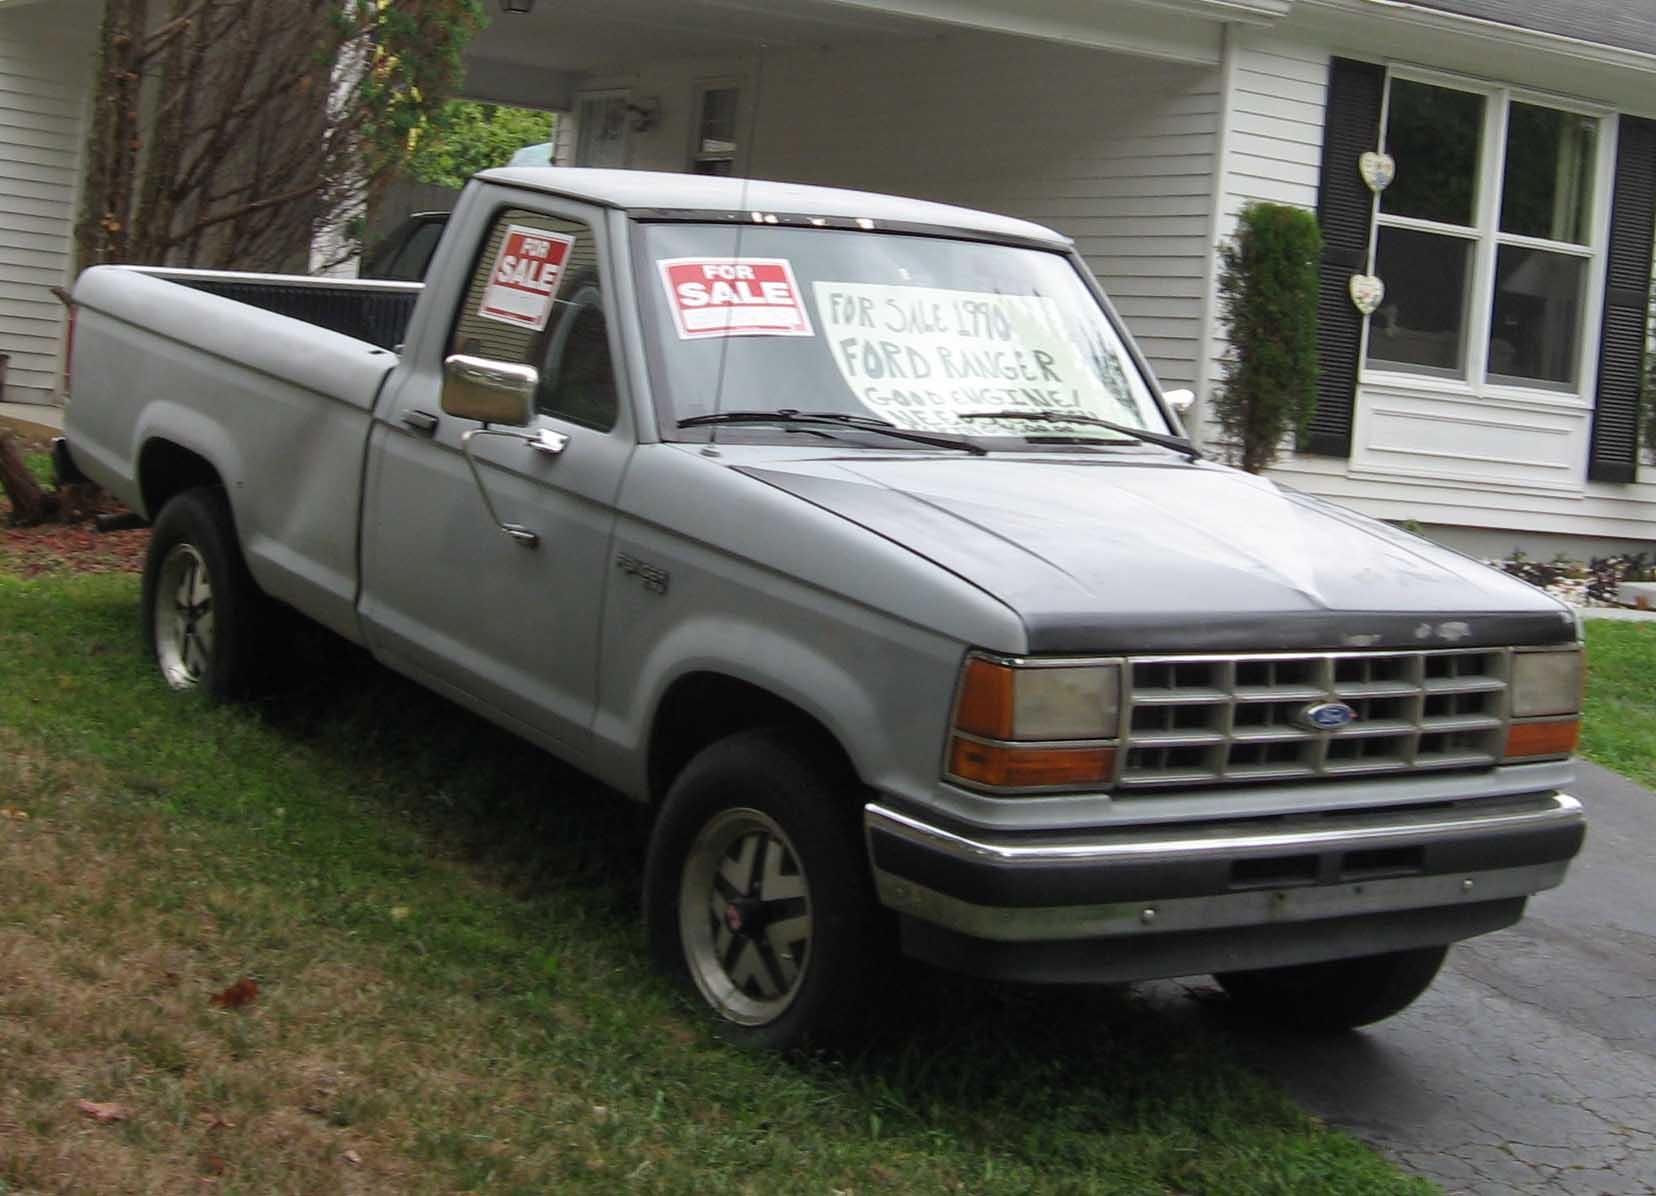 Ford Ranger (North America) I 1983 - 1988 Pickup #4